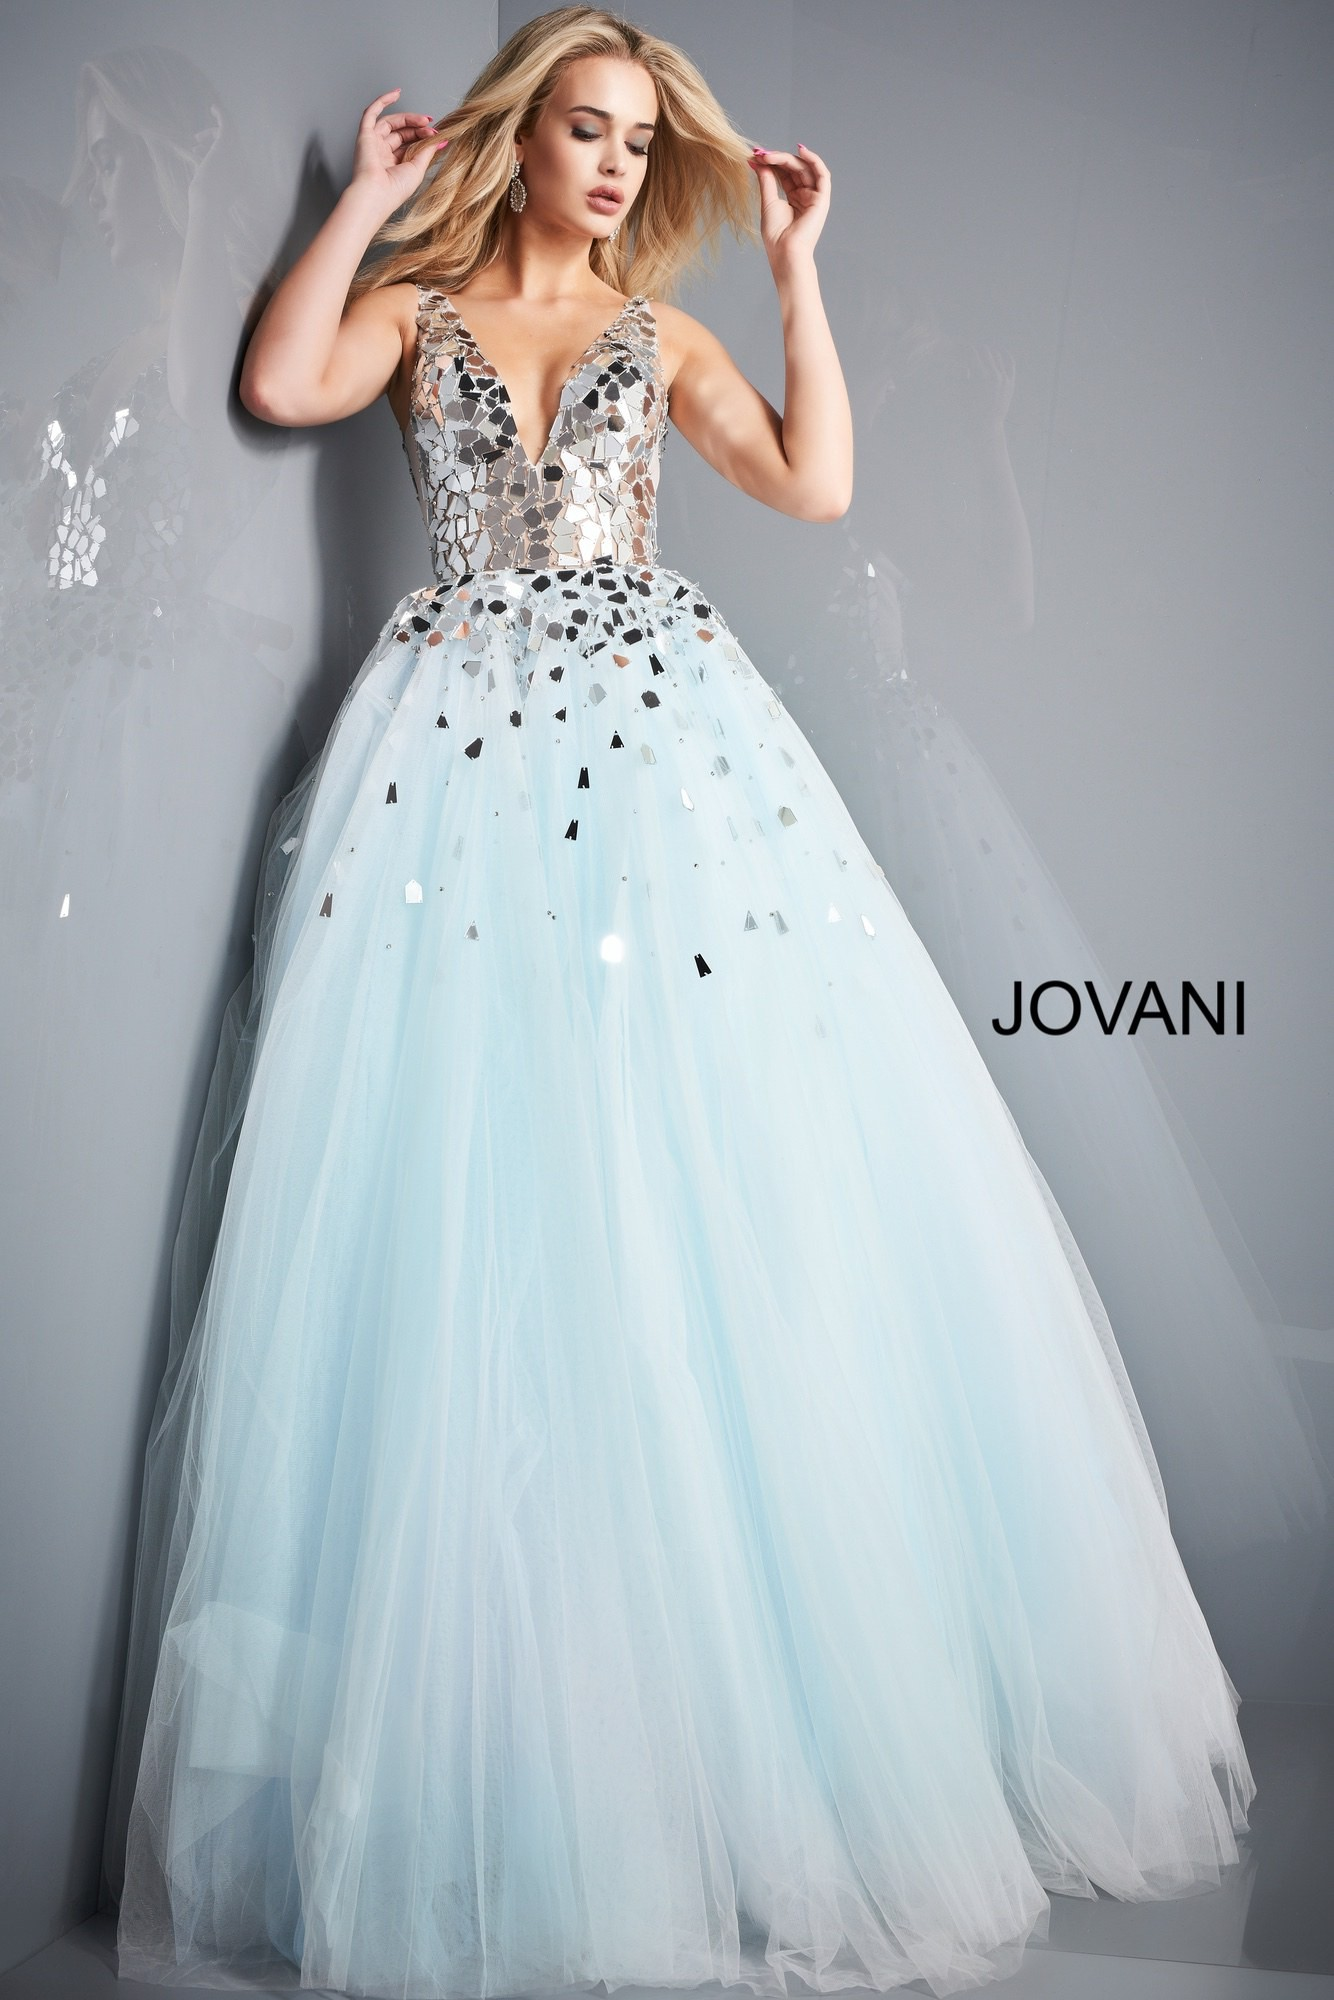 Jovani 00007 Light Blue Cut Glass Bodice Ball Gown